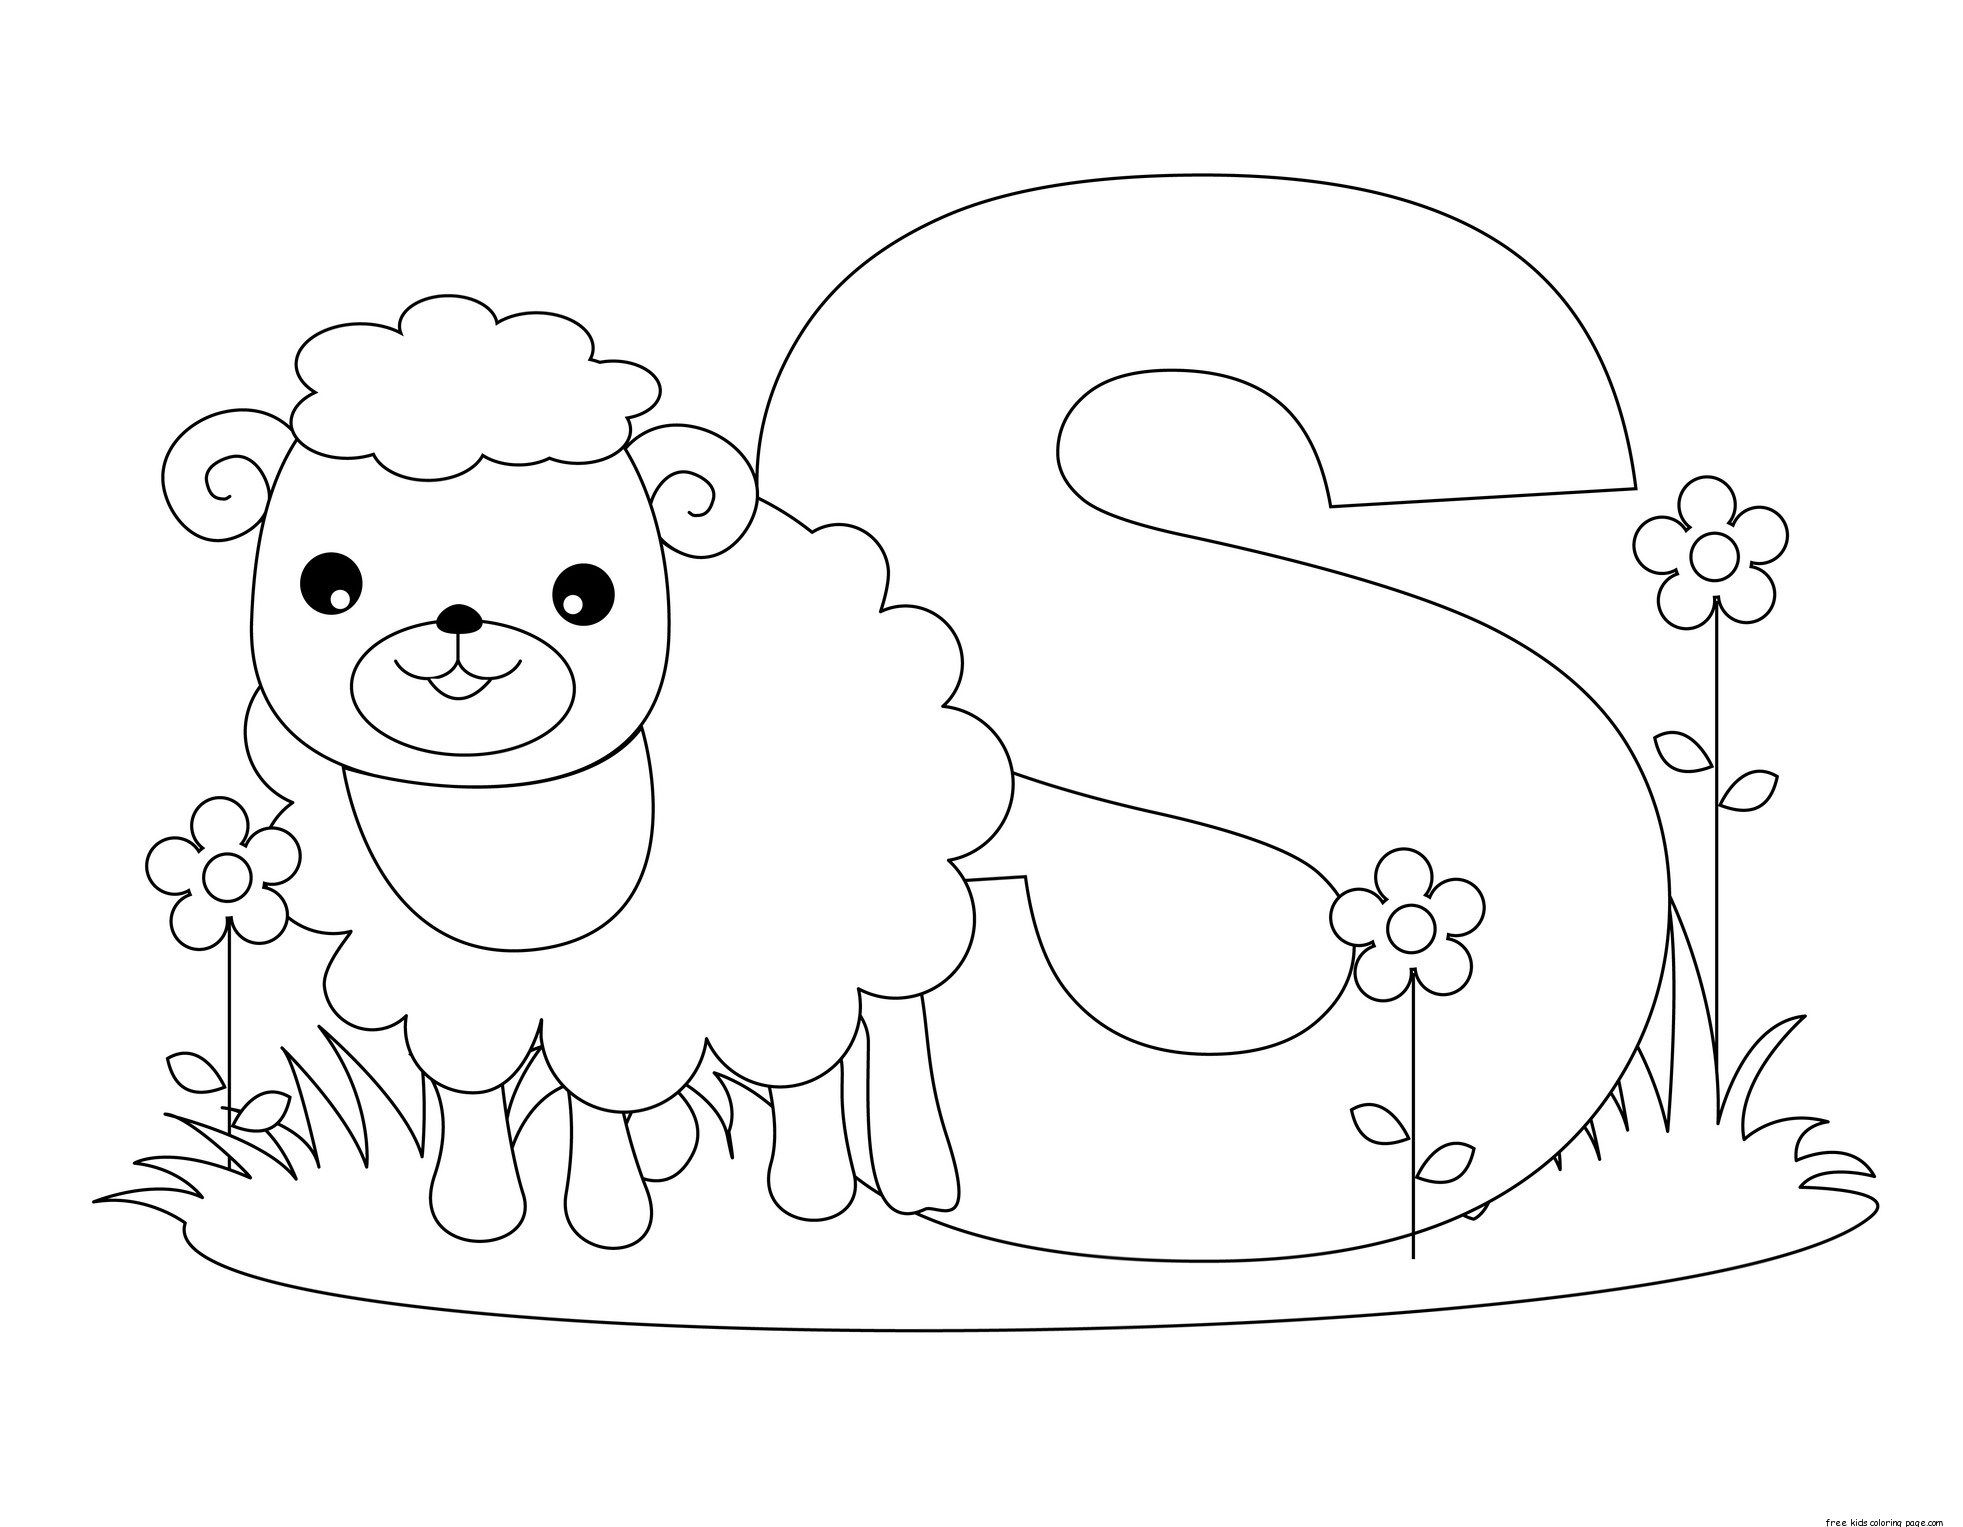 Printable Animal Alphabet Letter S Is For Sheep For Kids